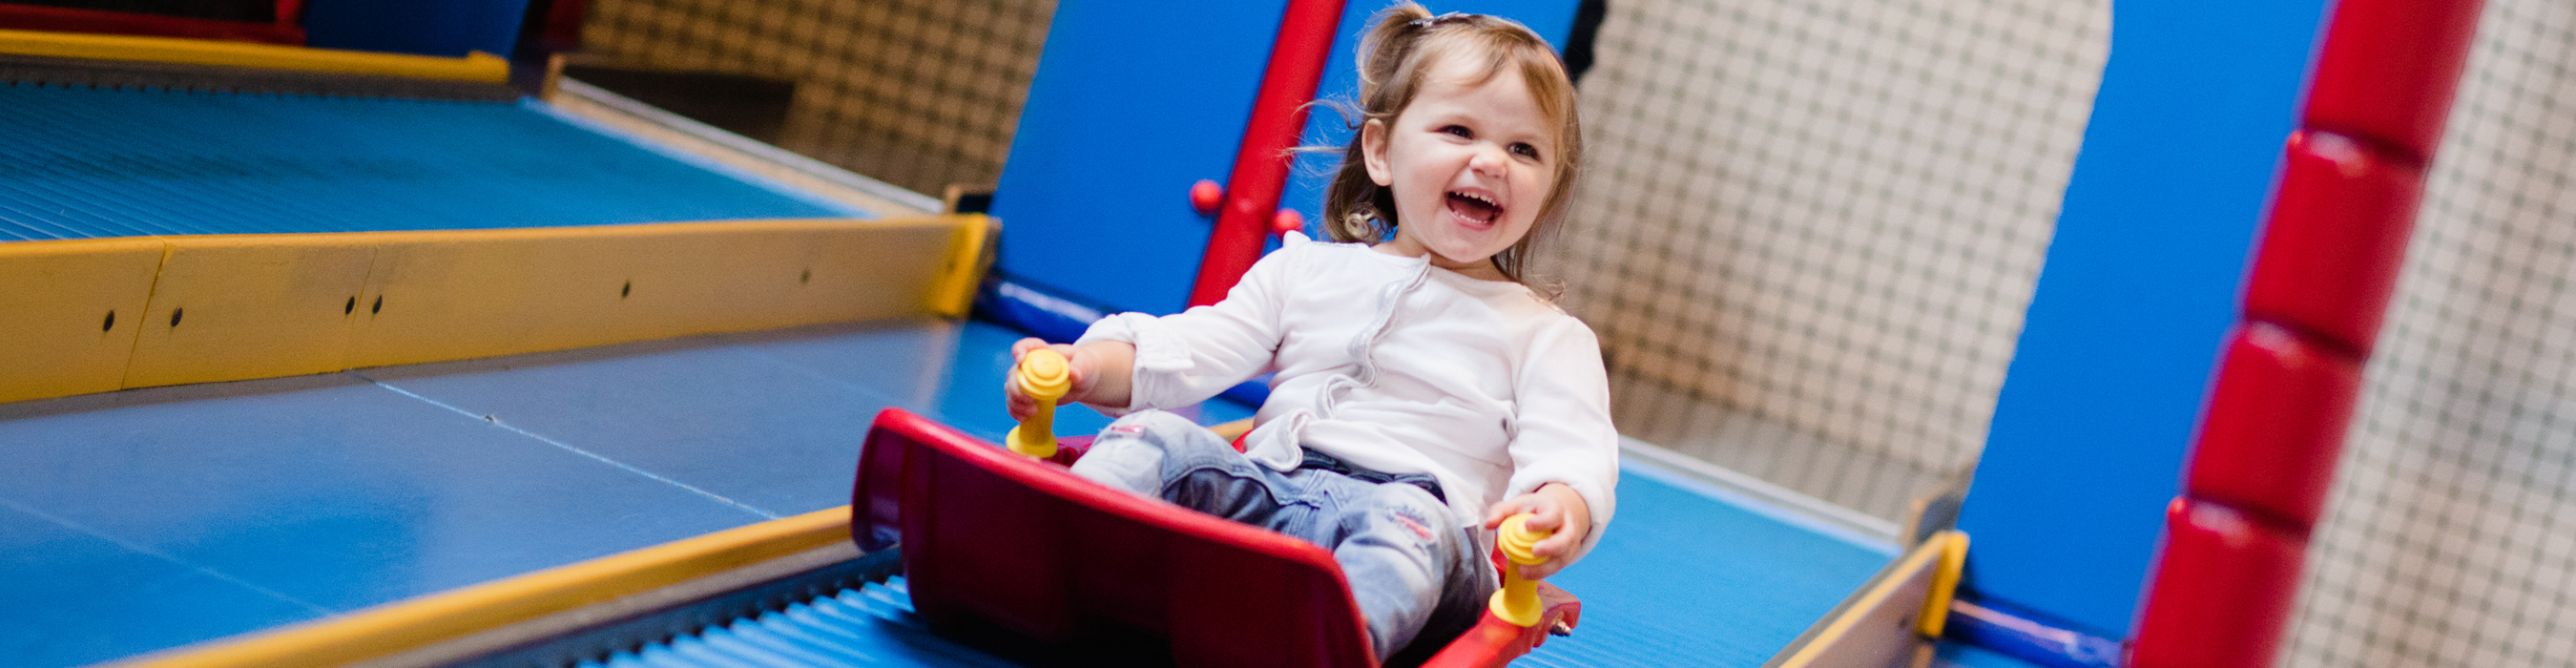 Afbeelding 5 - Kids Castle - Kinderspeelparadijs